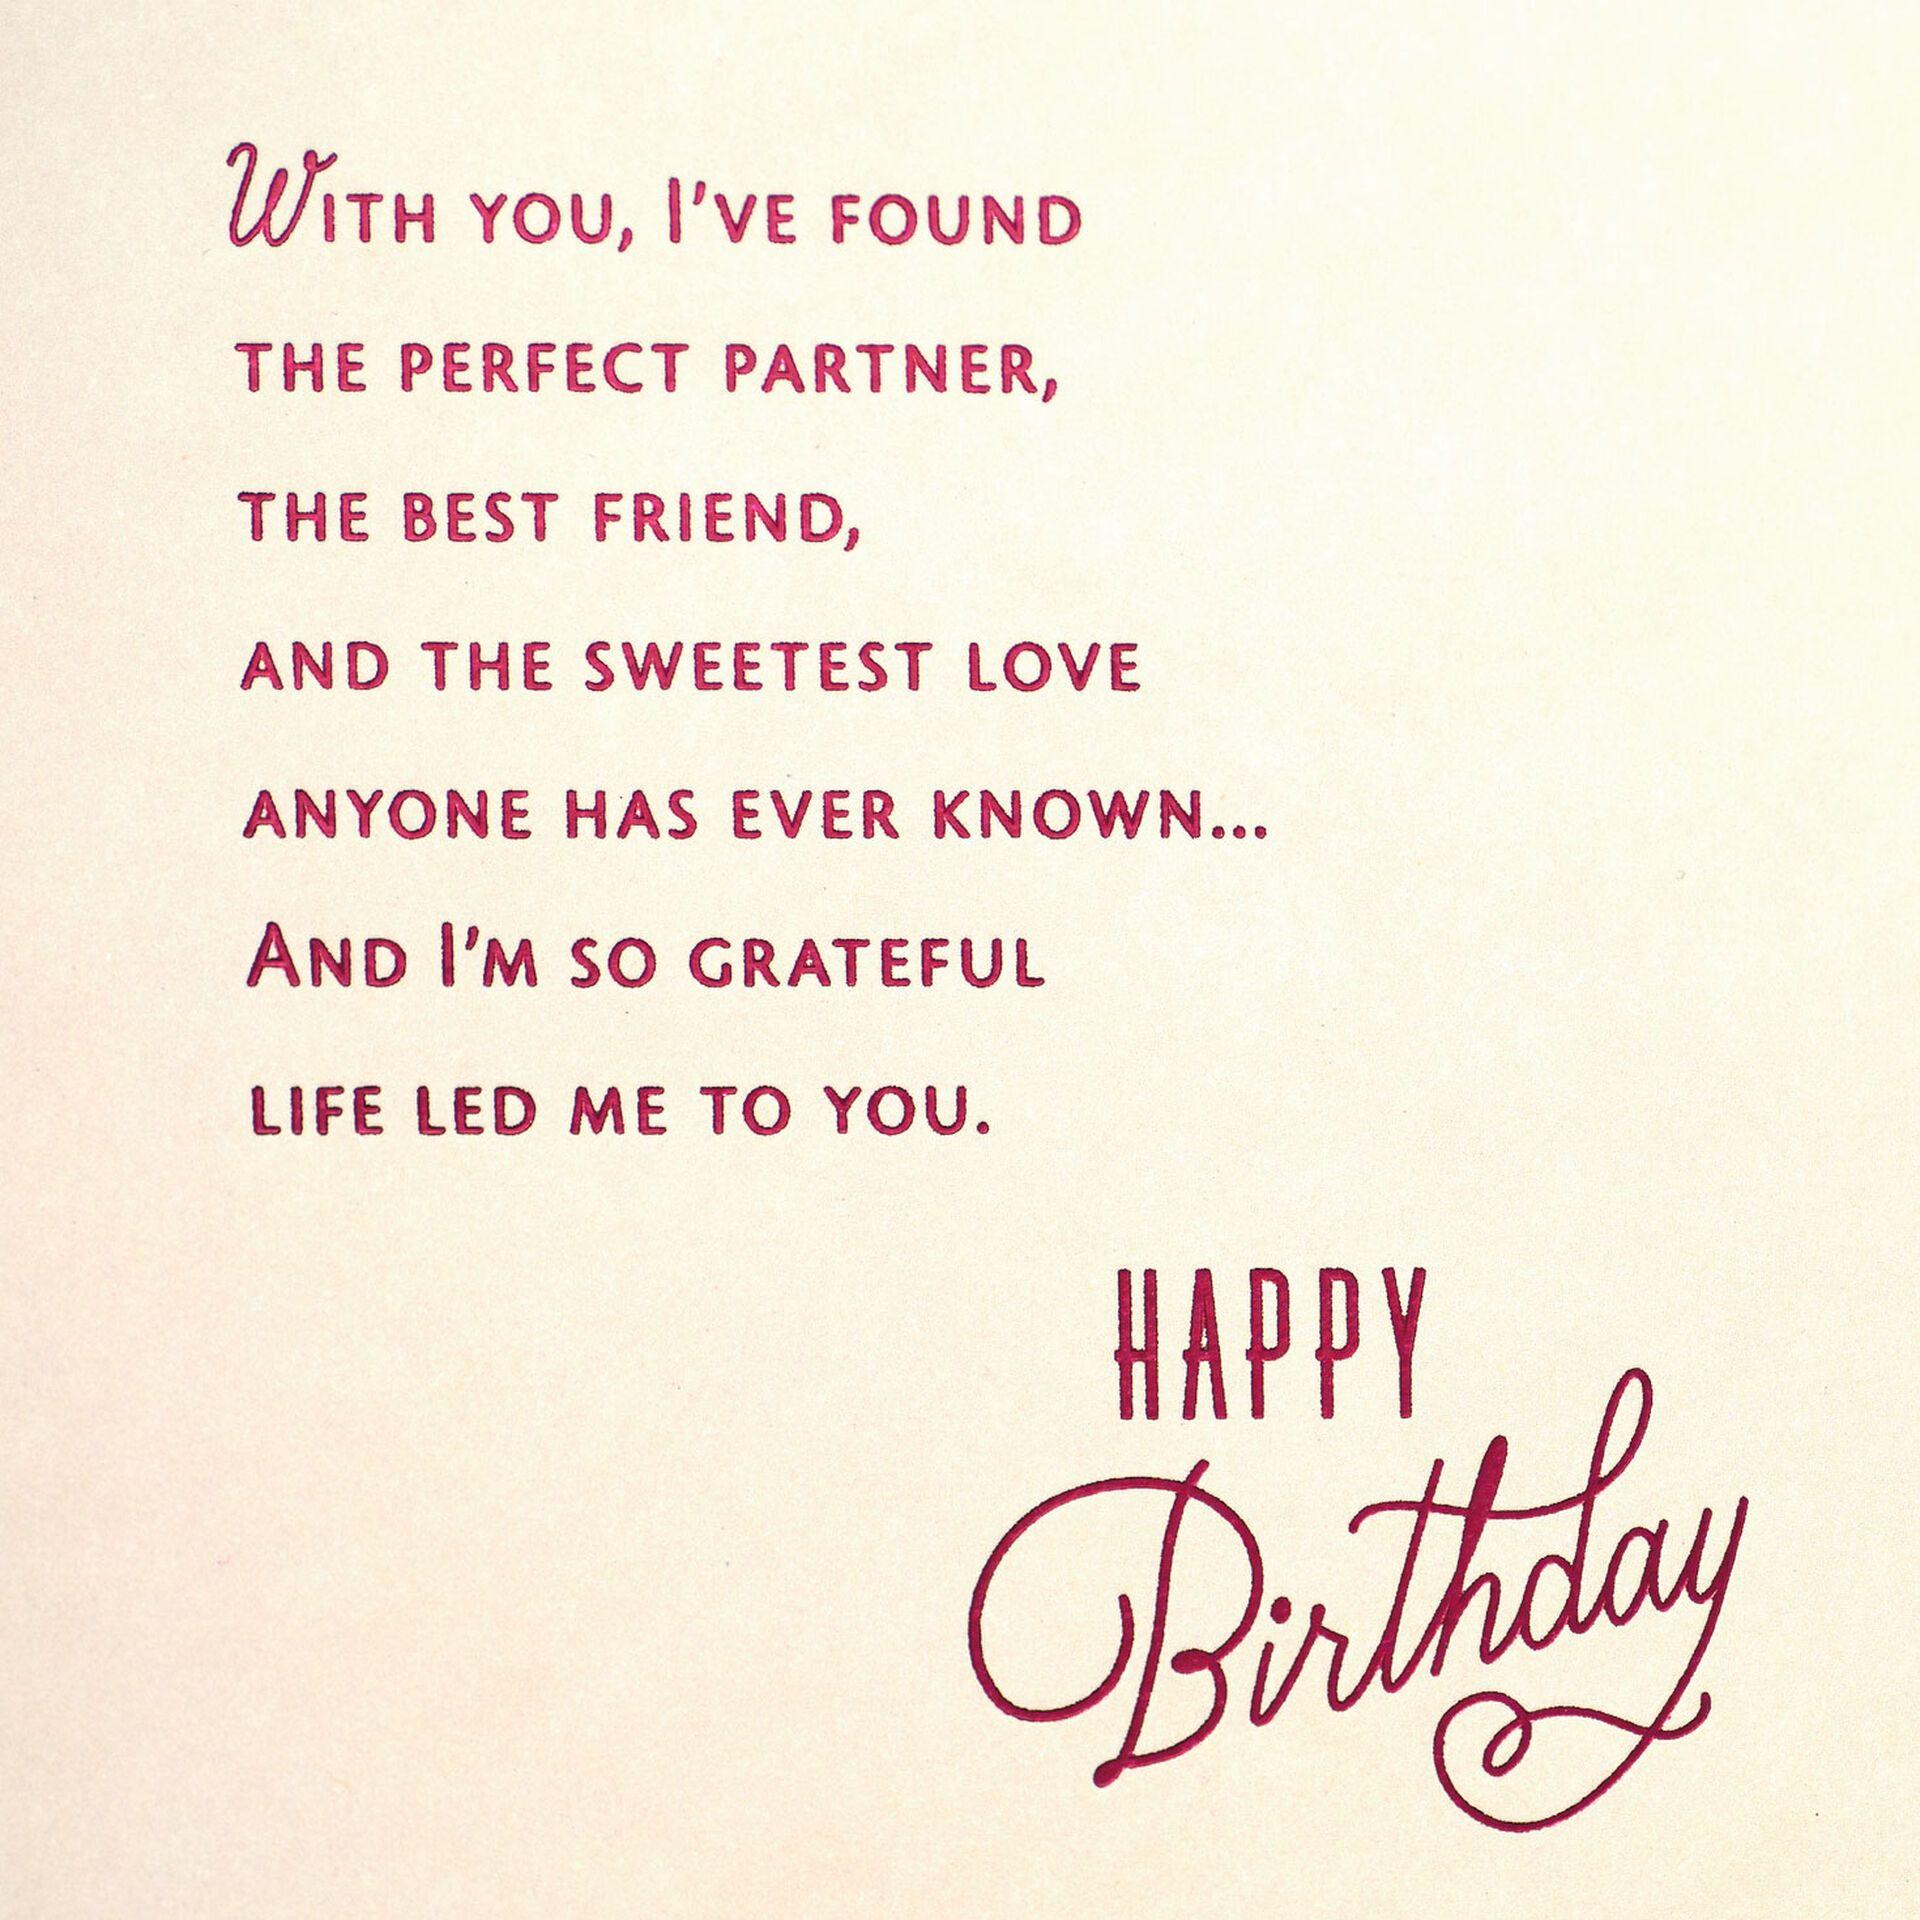 The Wonderful Man I Love Birthday Card In 2021 Happy Birthday Quotes For Him Happy Birthday Husband Quotes Happy Birthday Wishes For Him